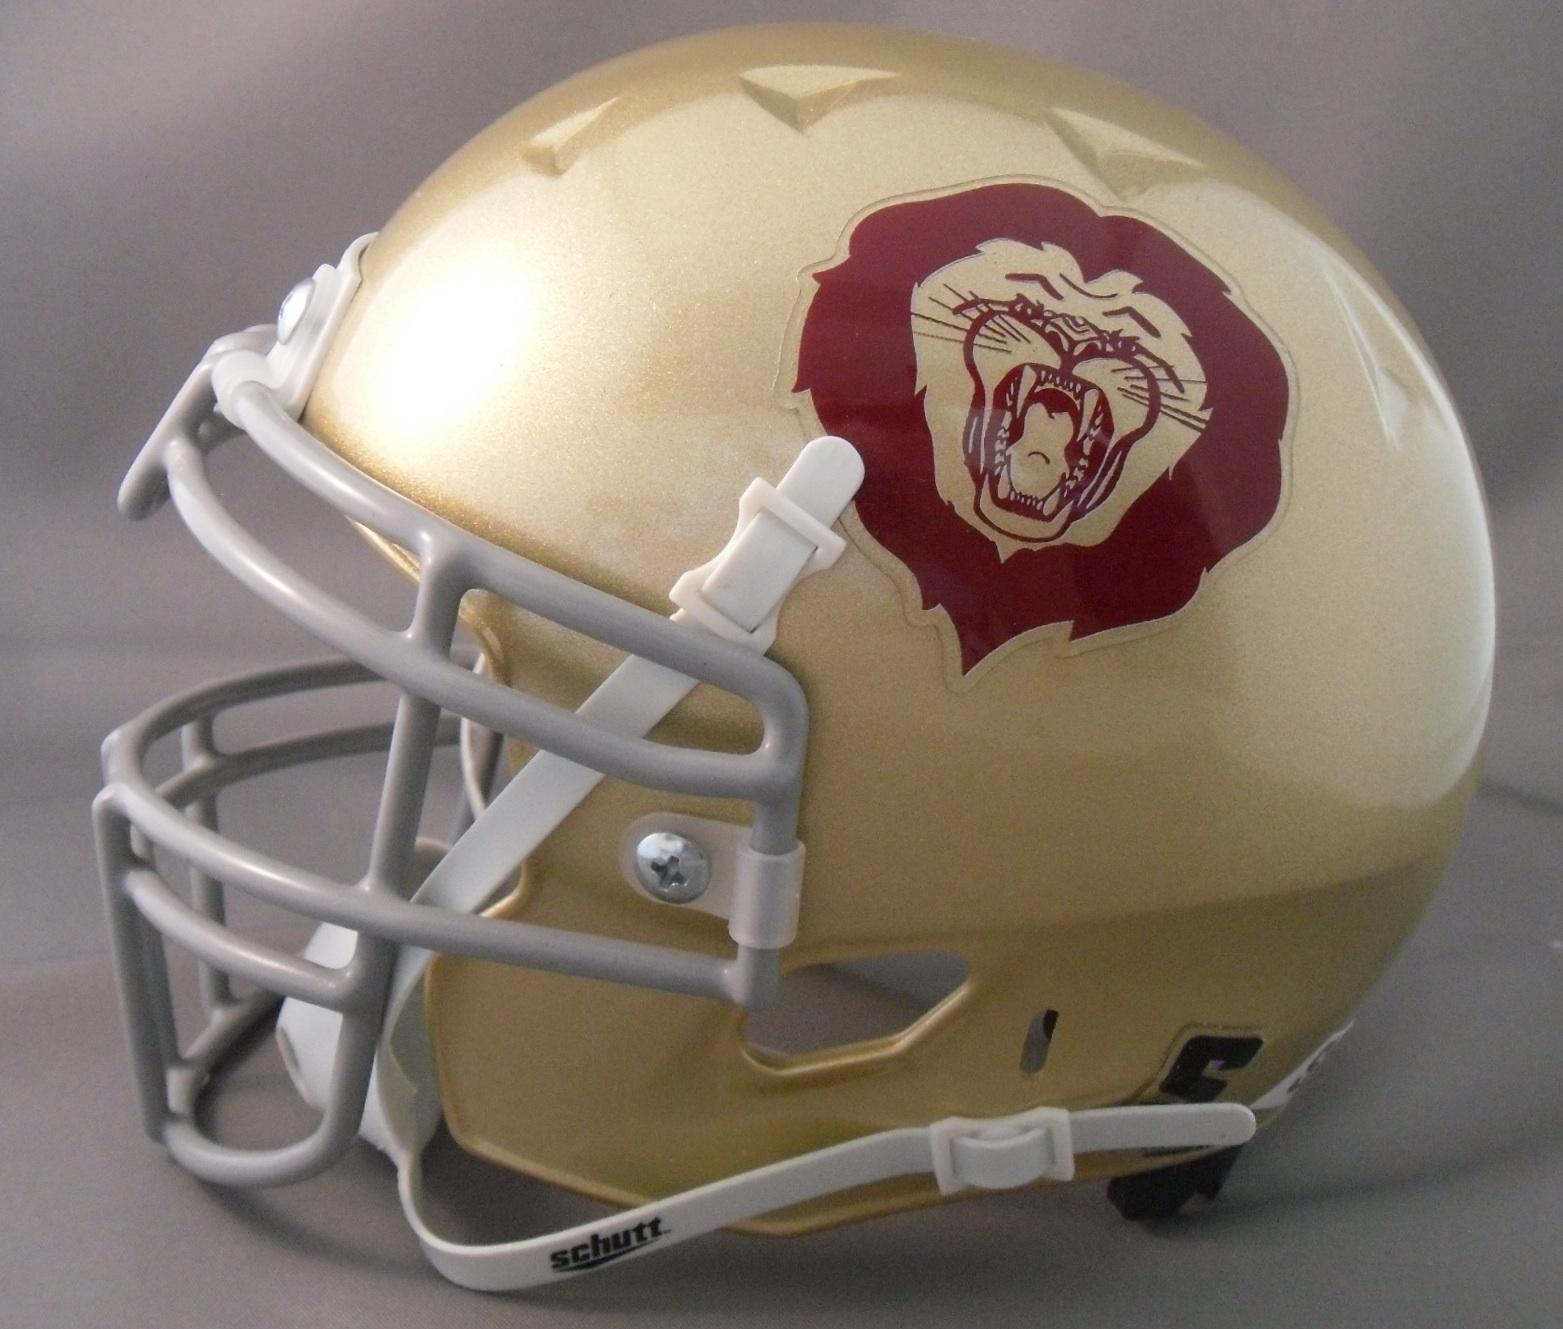 Back Bumper Football Helmets Types : Helmetnation sacs lions youth football